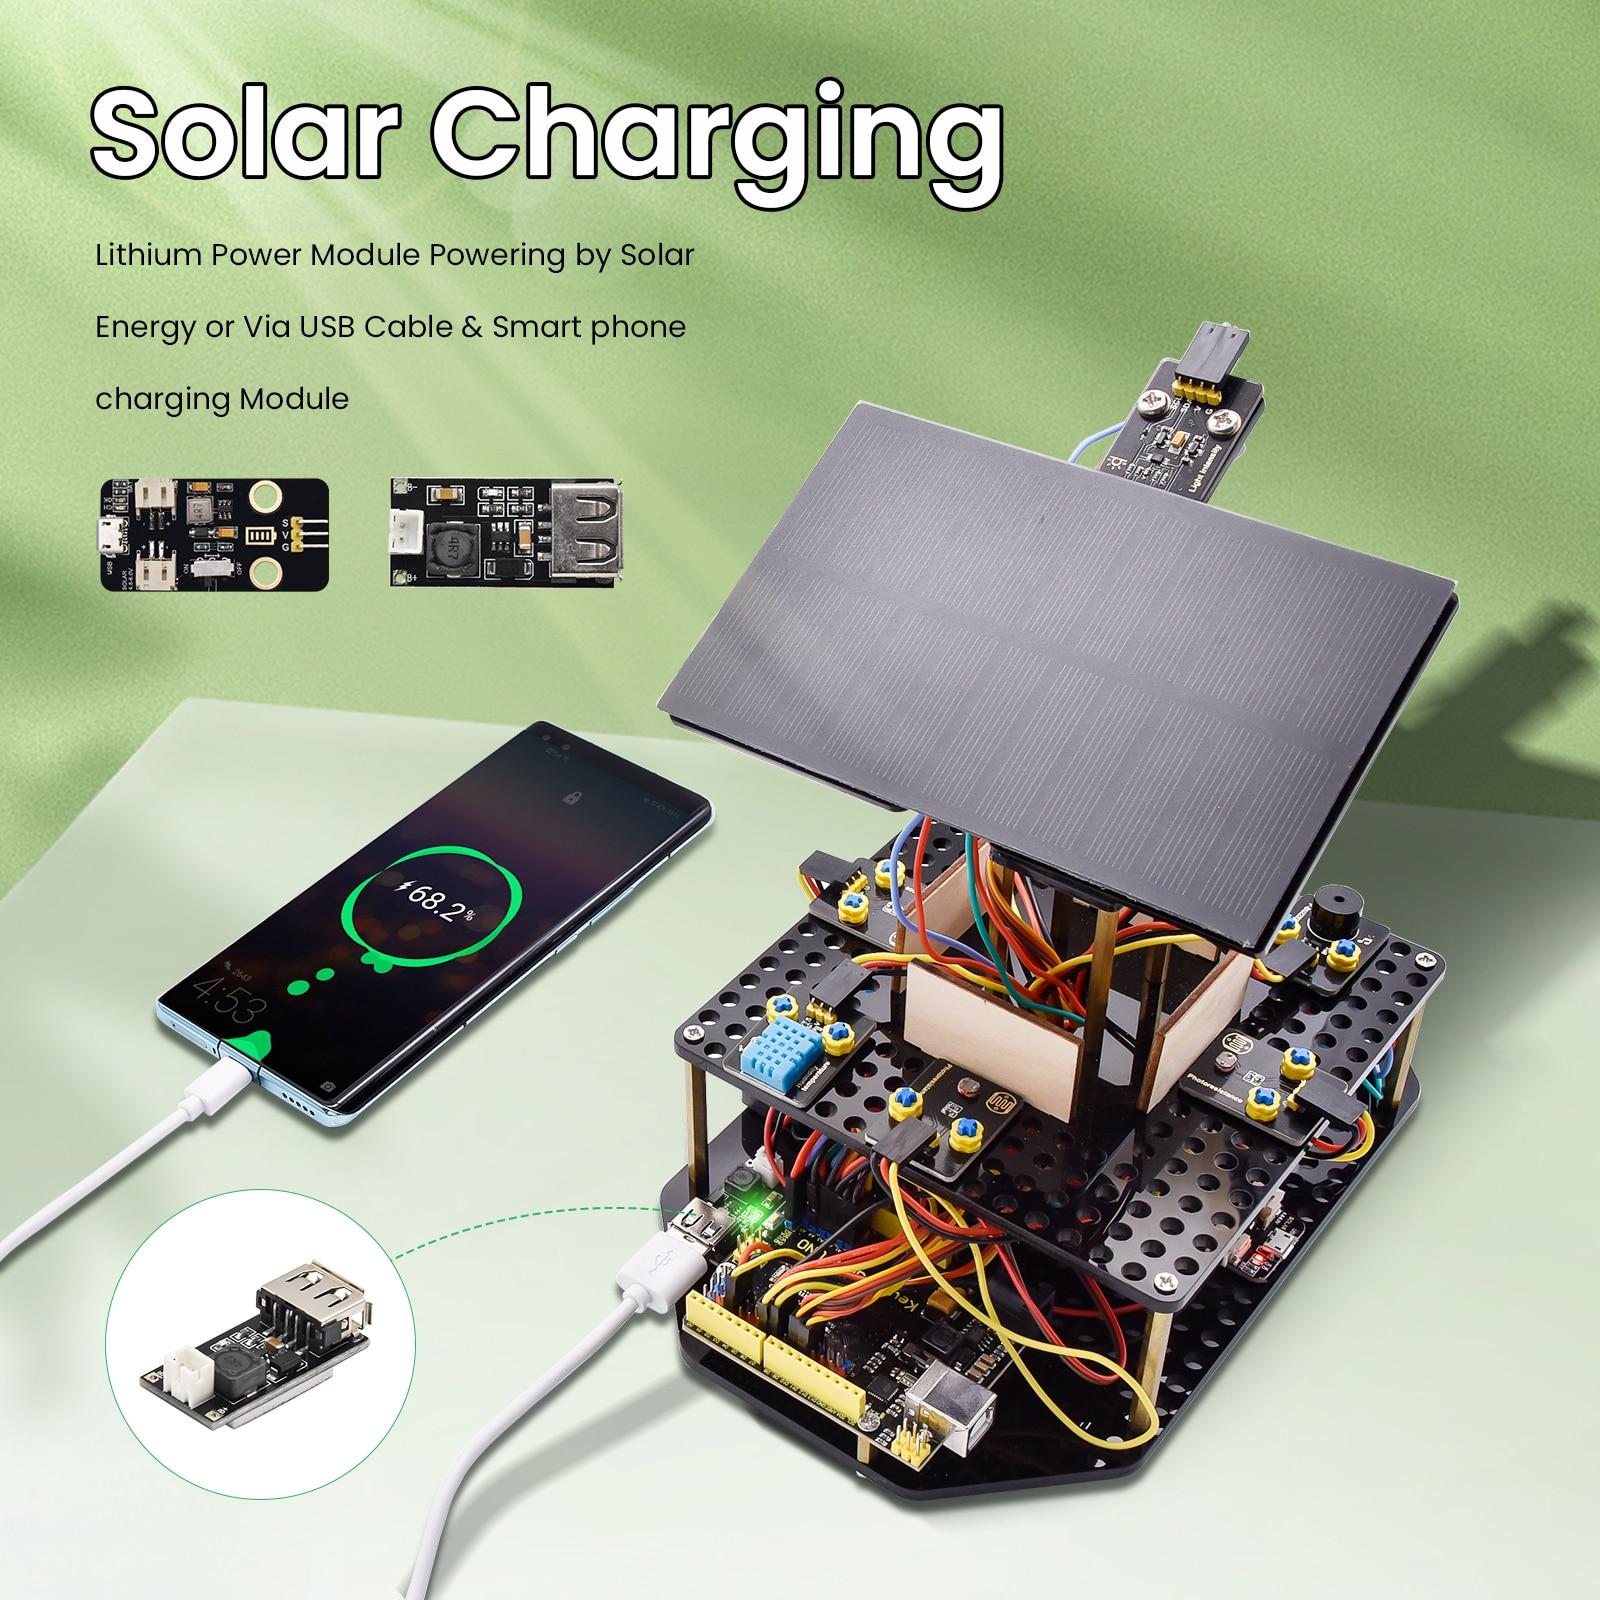 Keyestudio الاكريليك الذكية متعقب الشمس نظام تتبع كاتب عدة ل اردوينو الجذعية برمجة اللعب لتقوم بها بنفسك شحن الهاتف المحمول